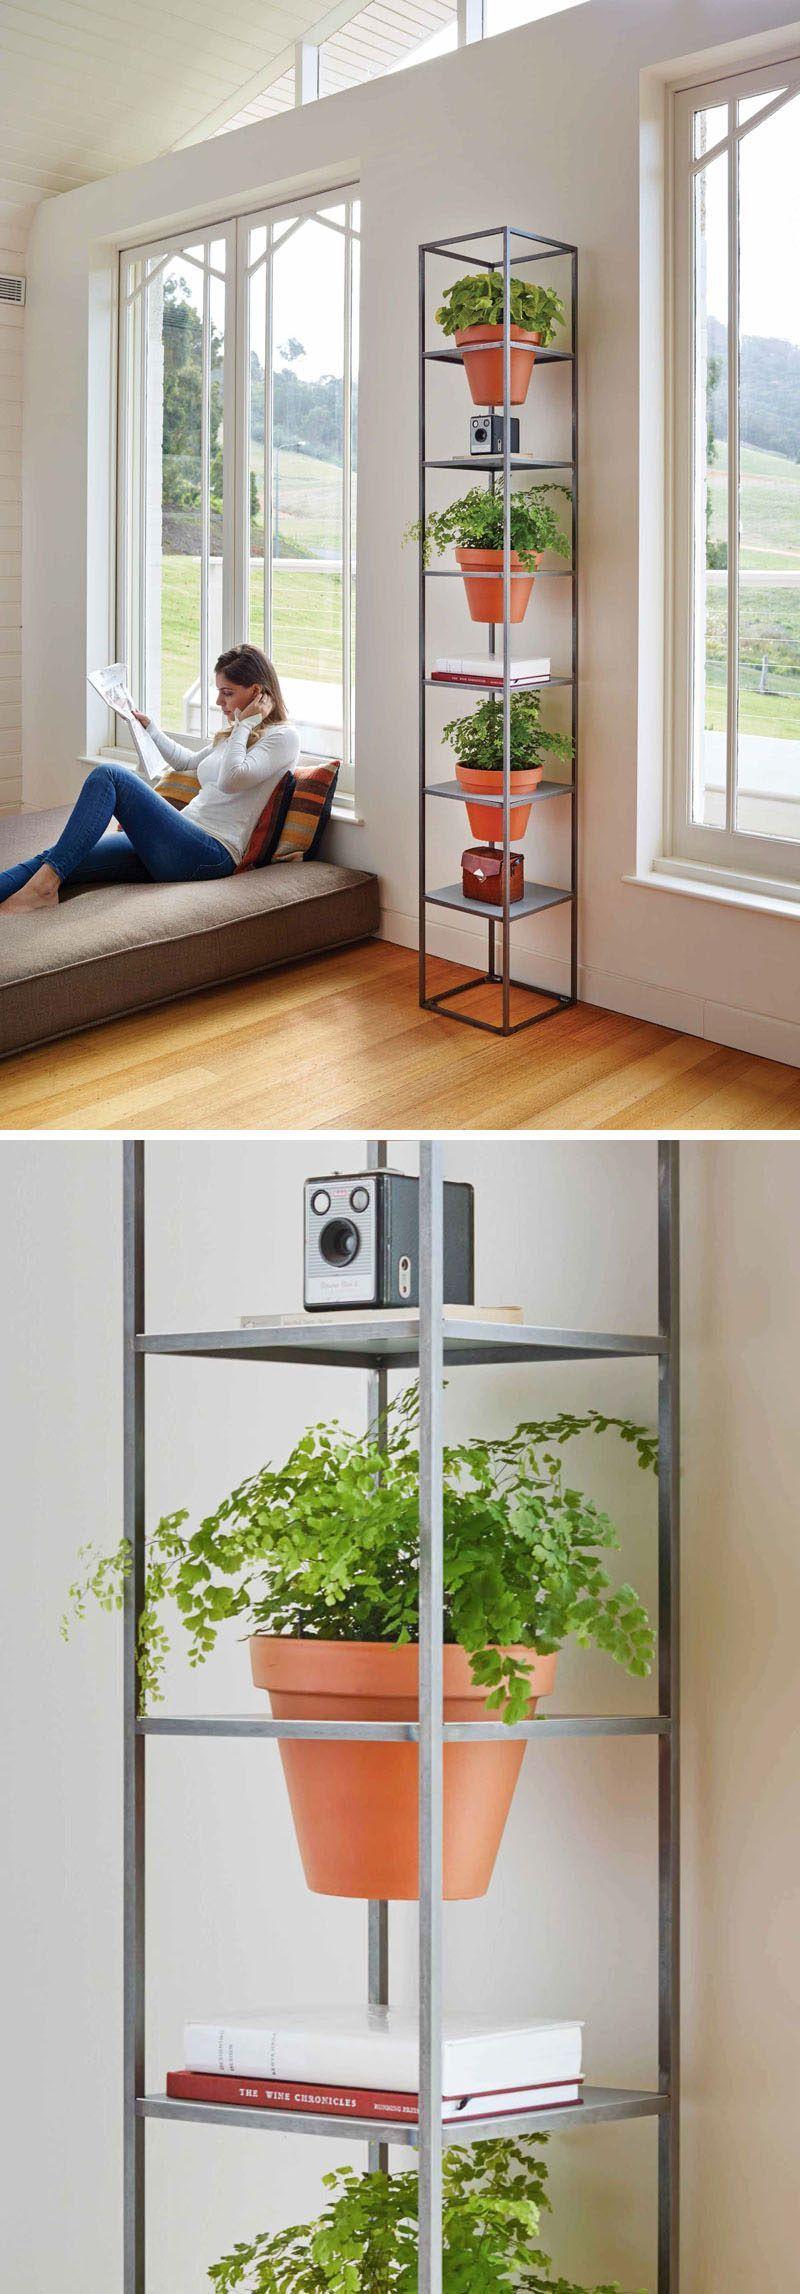 astonishing useful ideas room divider bookcase layout kallax room